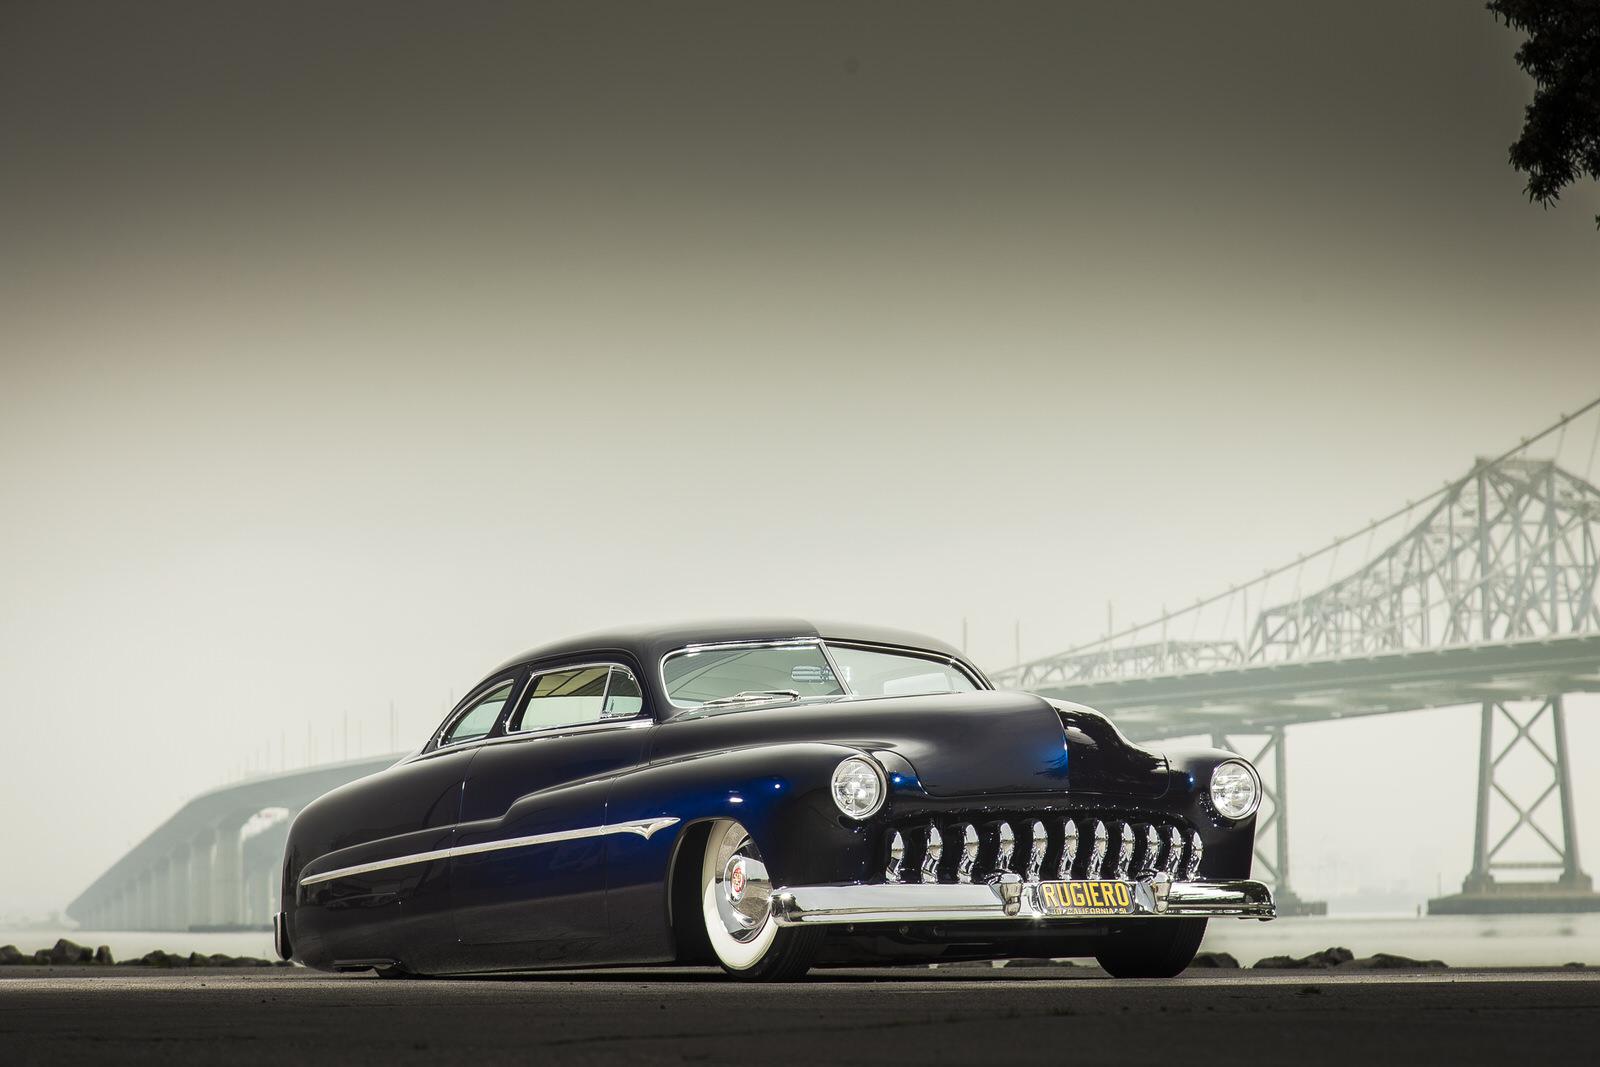 Nick Rogers 1951 Mercury (Ruggiero Mercury) - South City Rod & Custom - Photo by Tim Sutton